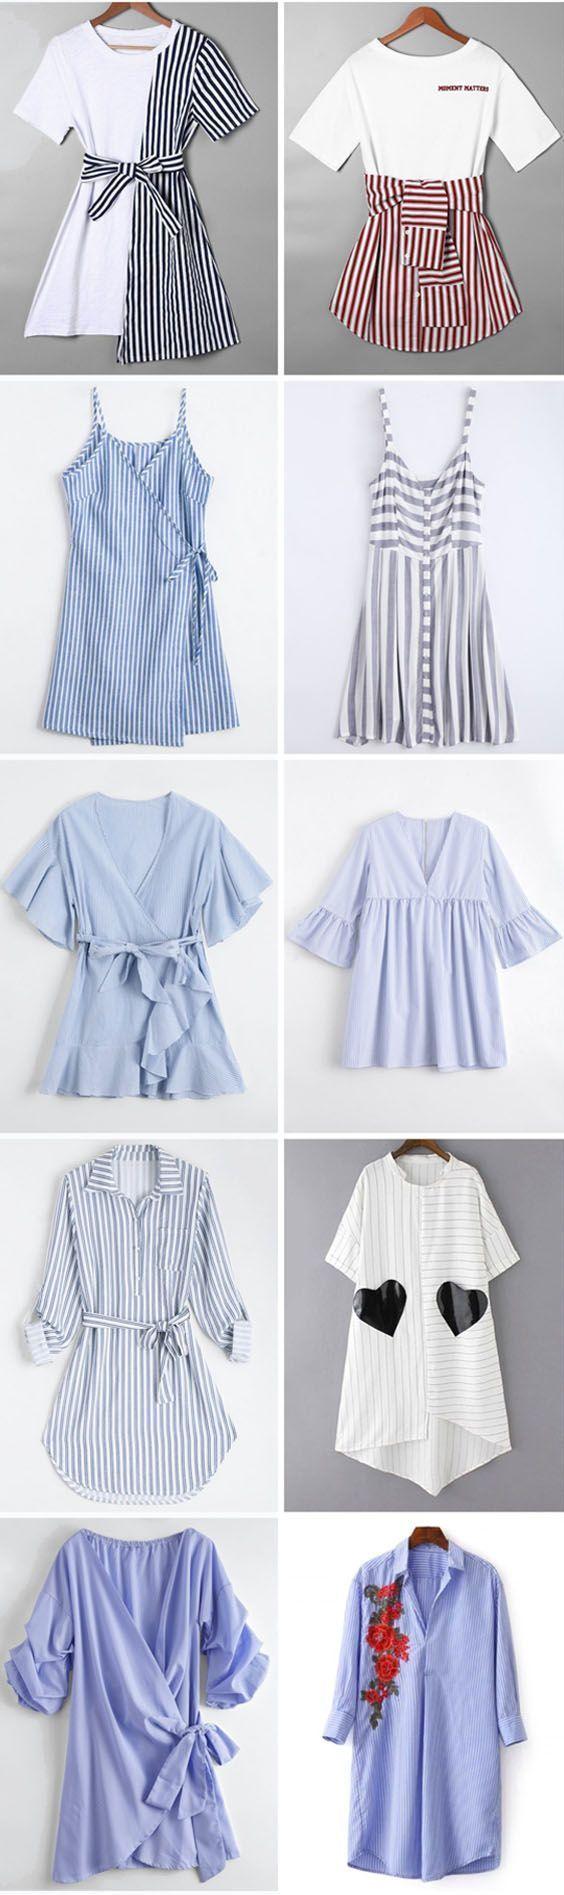 Zafuldressstriped dresssummerwomen fashionfall outfitswedding